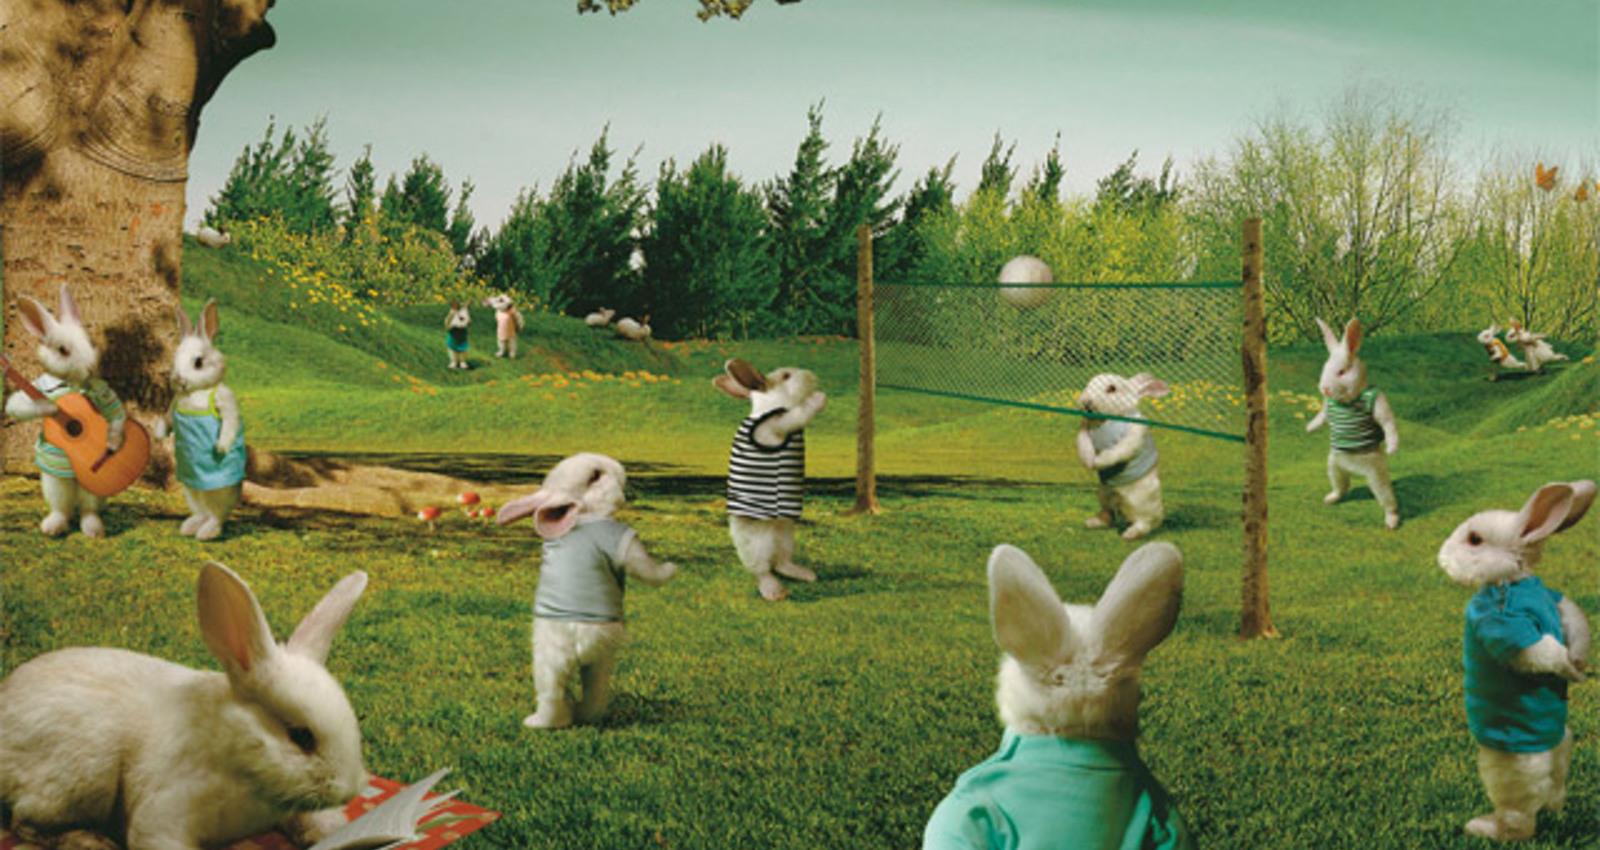 Tulipan, Rabbits